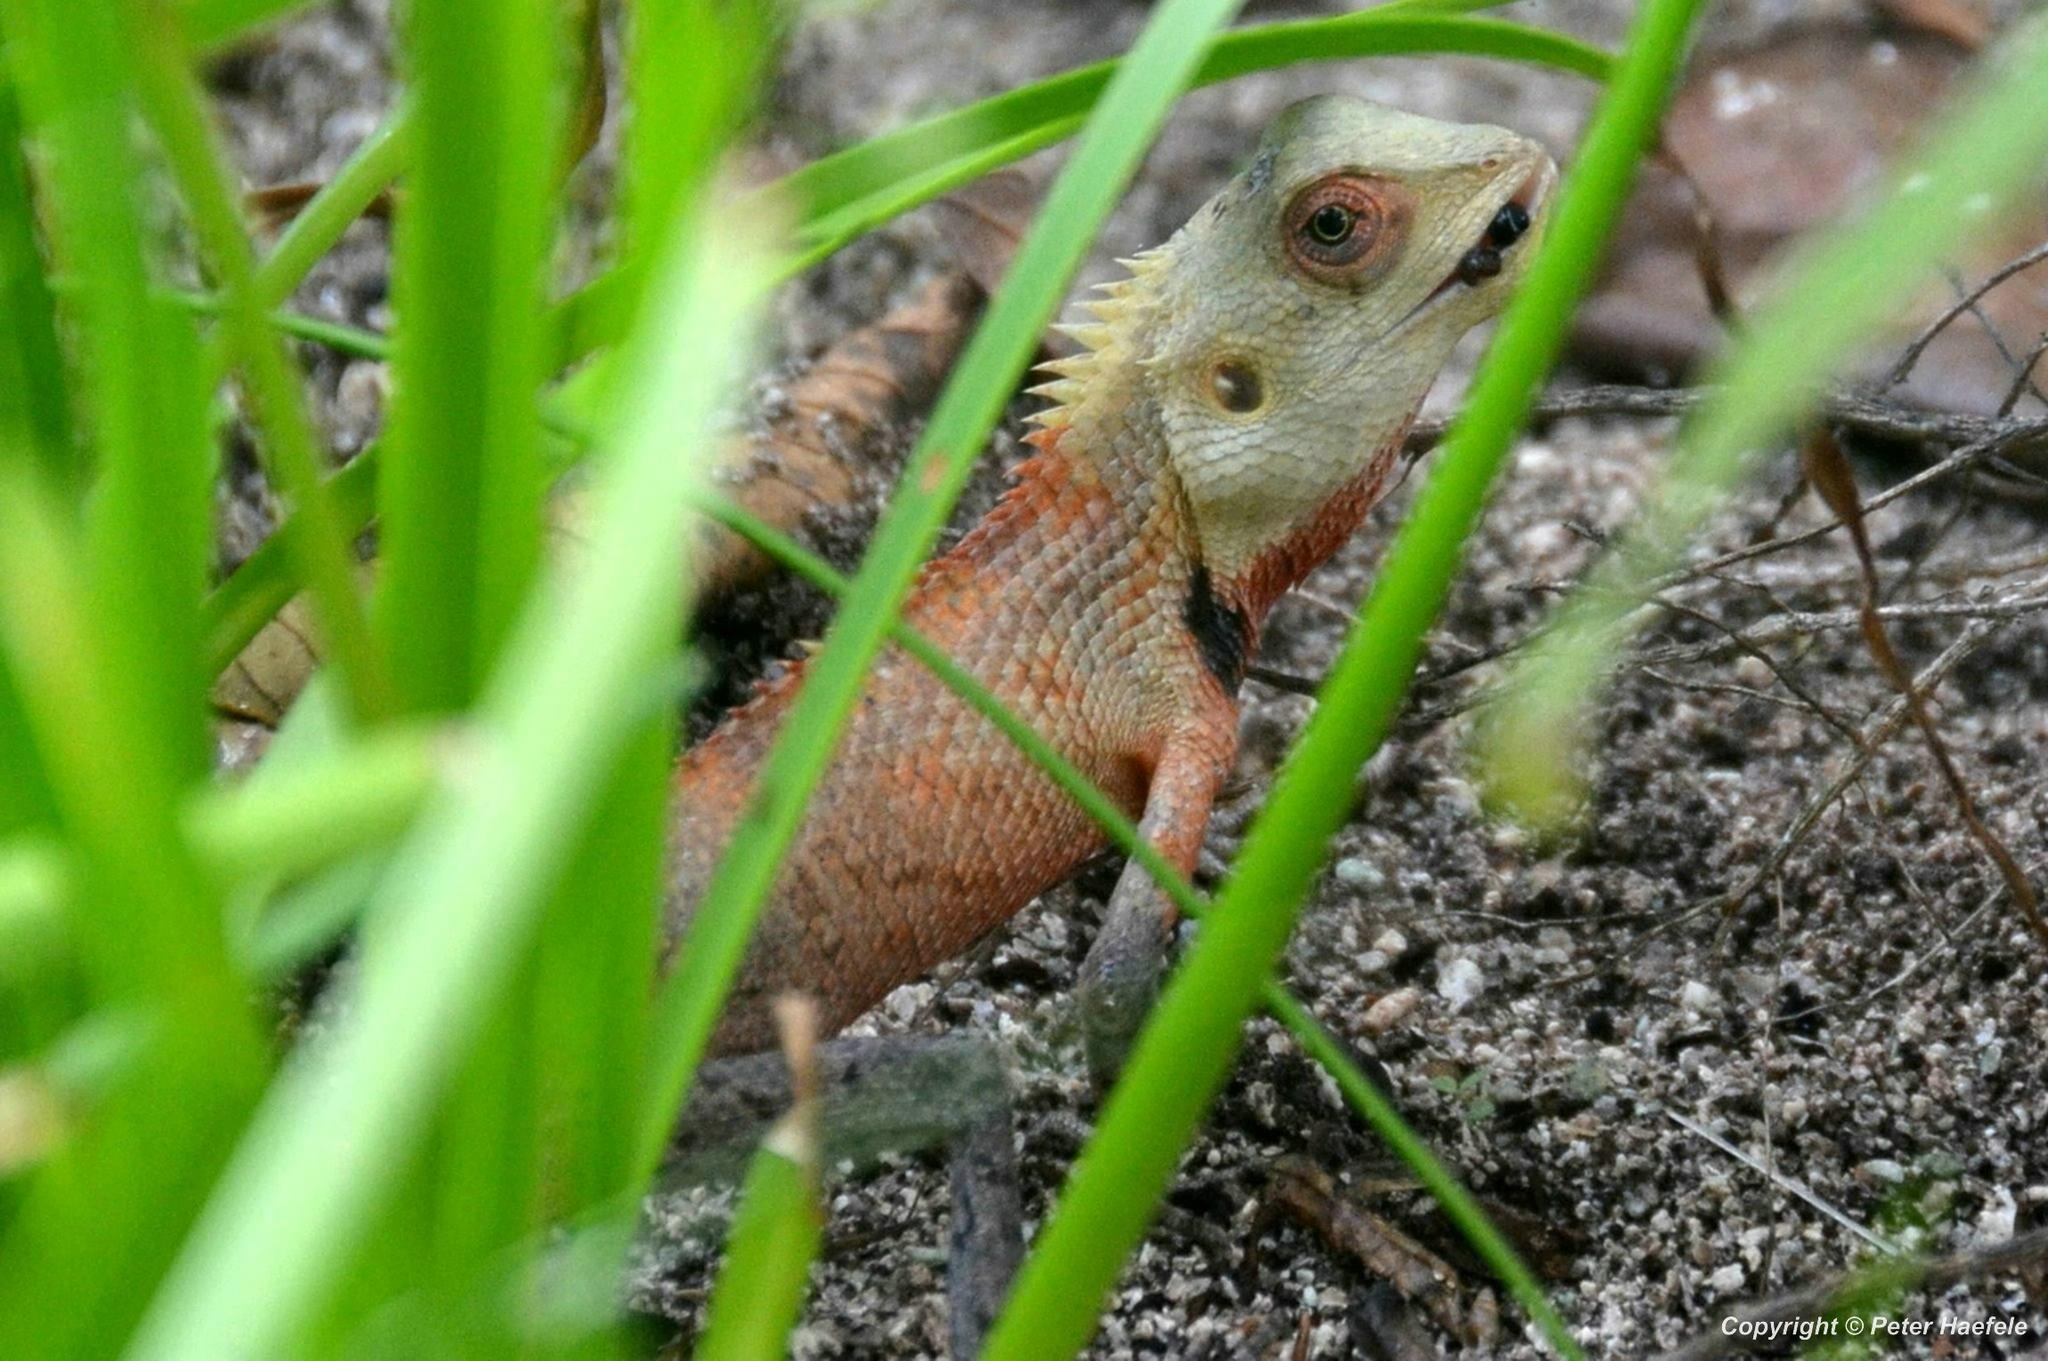 Blutsaugeragame (Calotes versicolor) Oriental garden lizard mit erbeuteter Ameise - Sun Island - Malediven